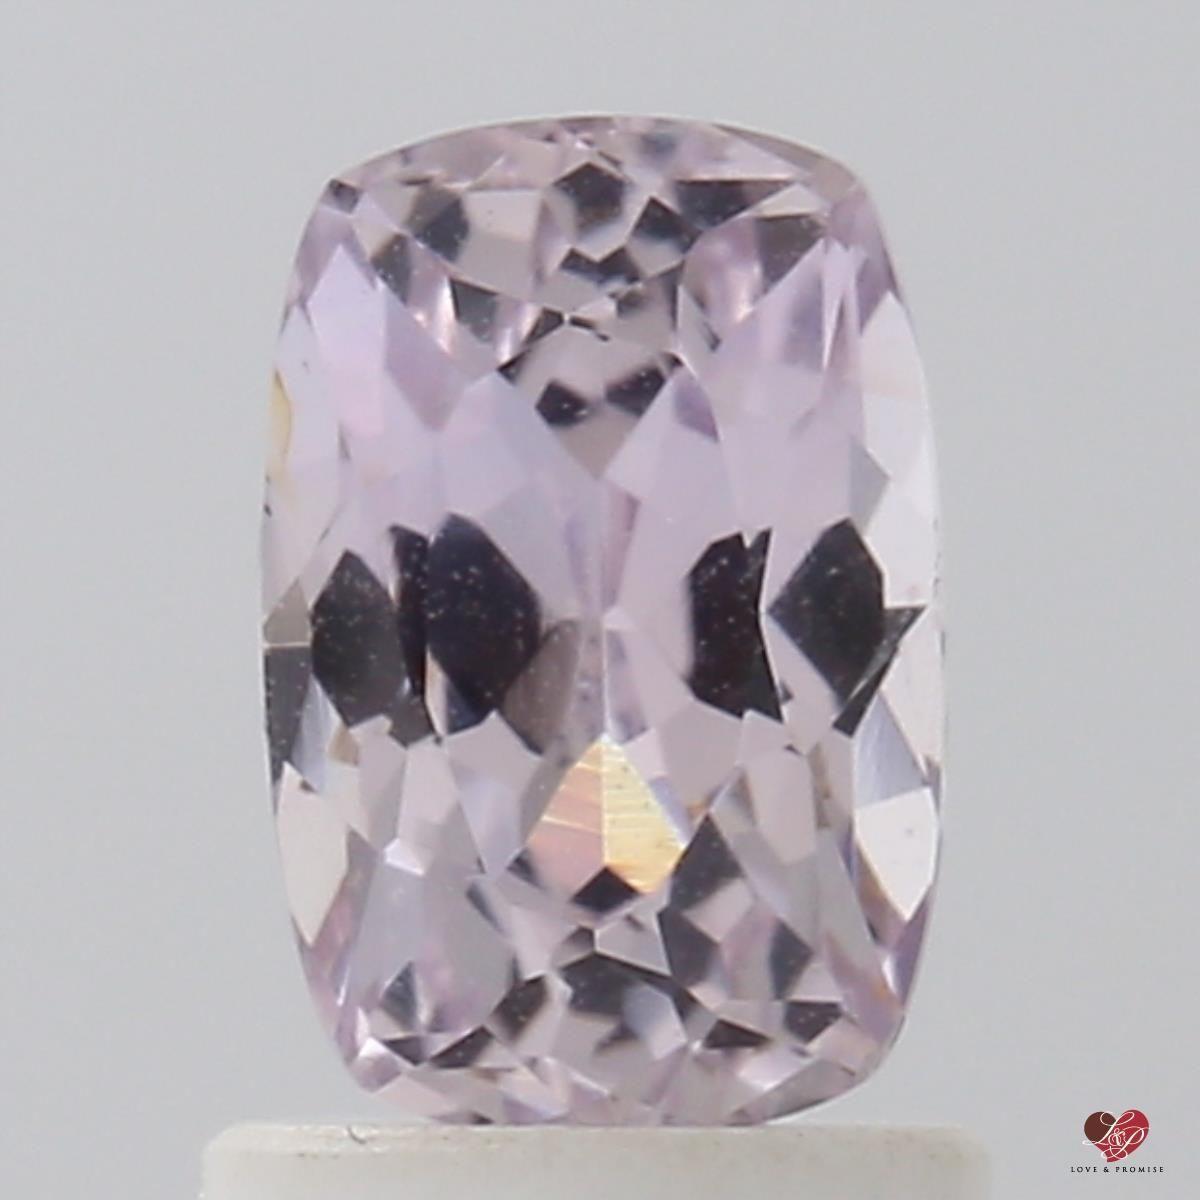 https://www.loveandpromisejewelers.com/media/catalog/product/cache/1b8ff75e92e9e3eb7d814fc024f6d8df/s/t/still_8_15.jpg